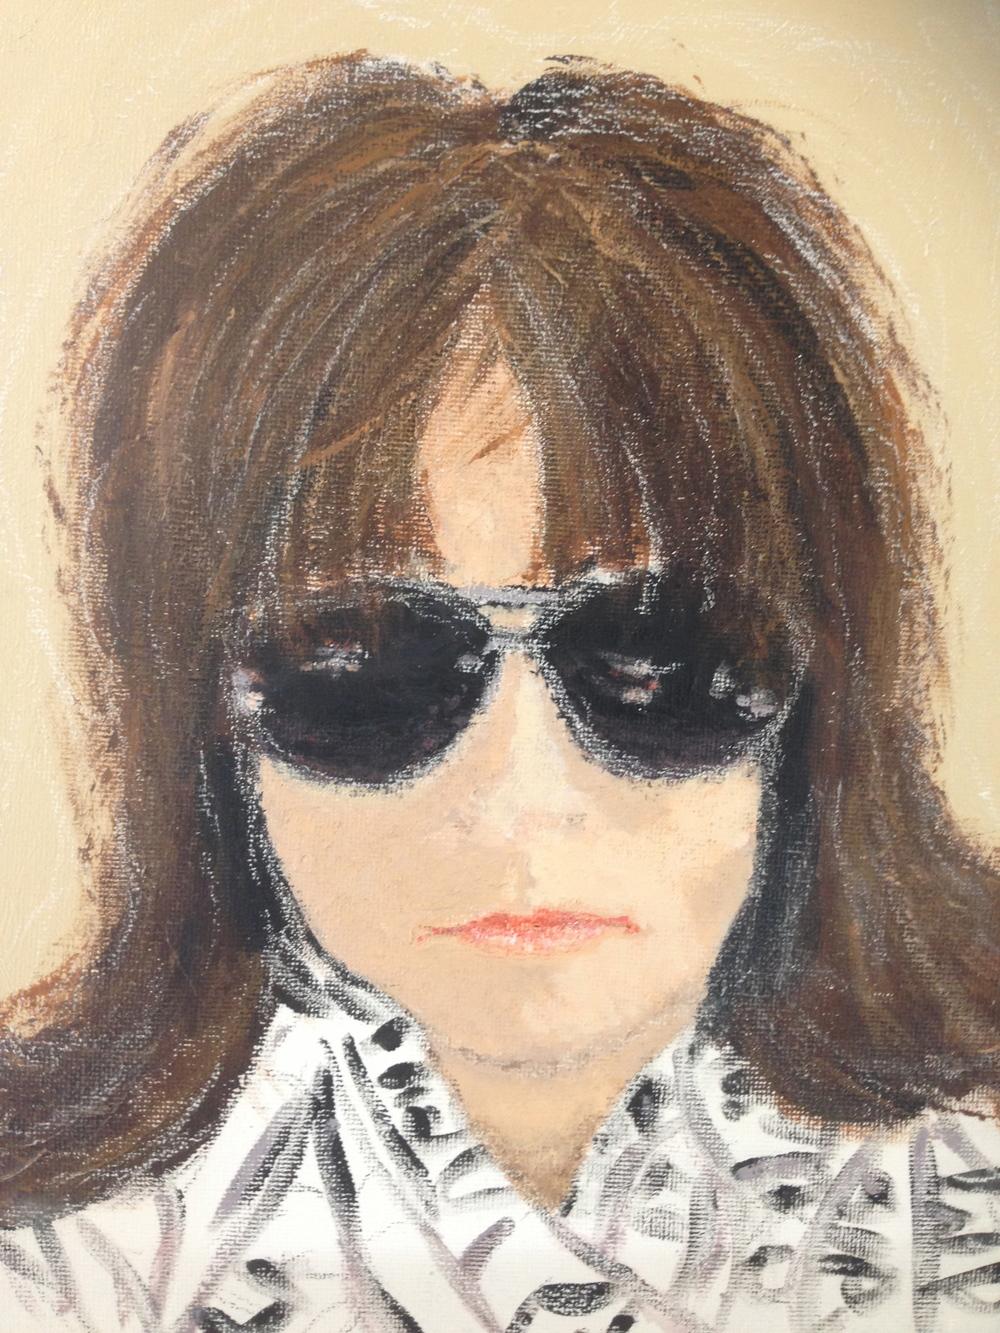 Self-Portrait: Mixed Media on Canvas, April 2014